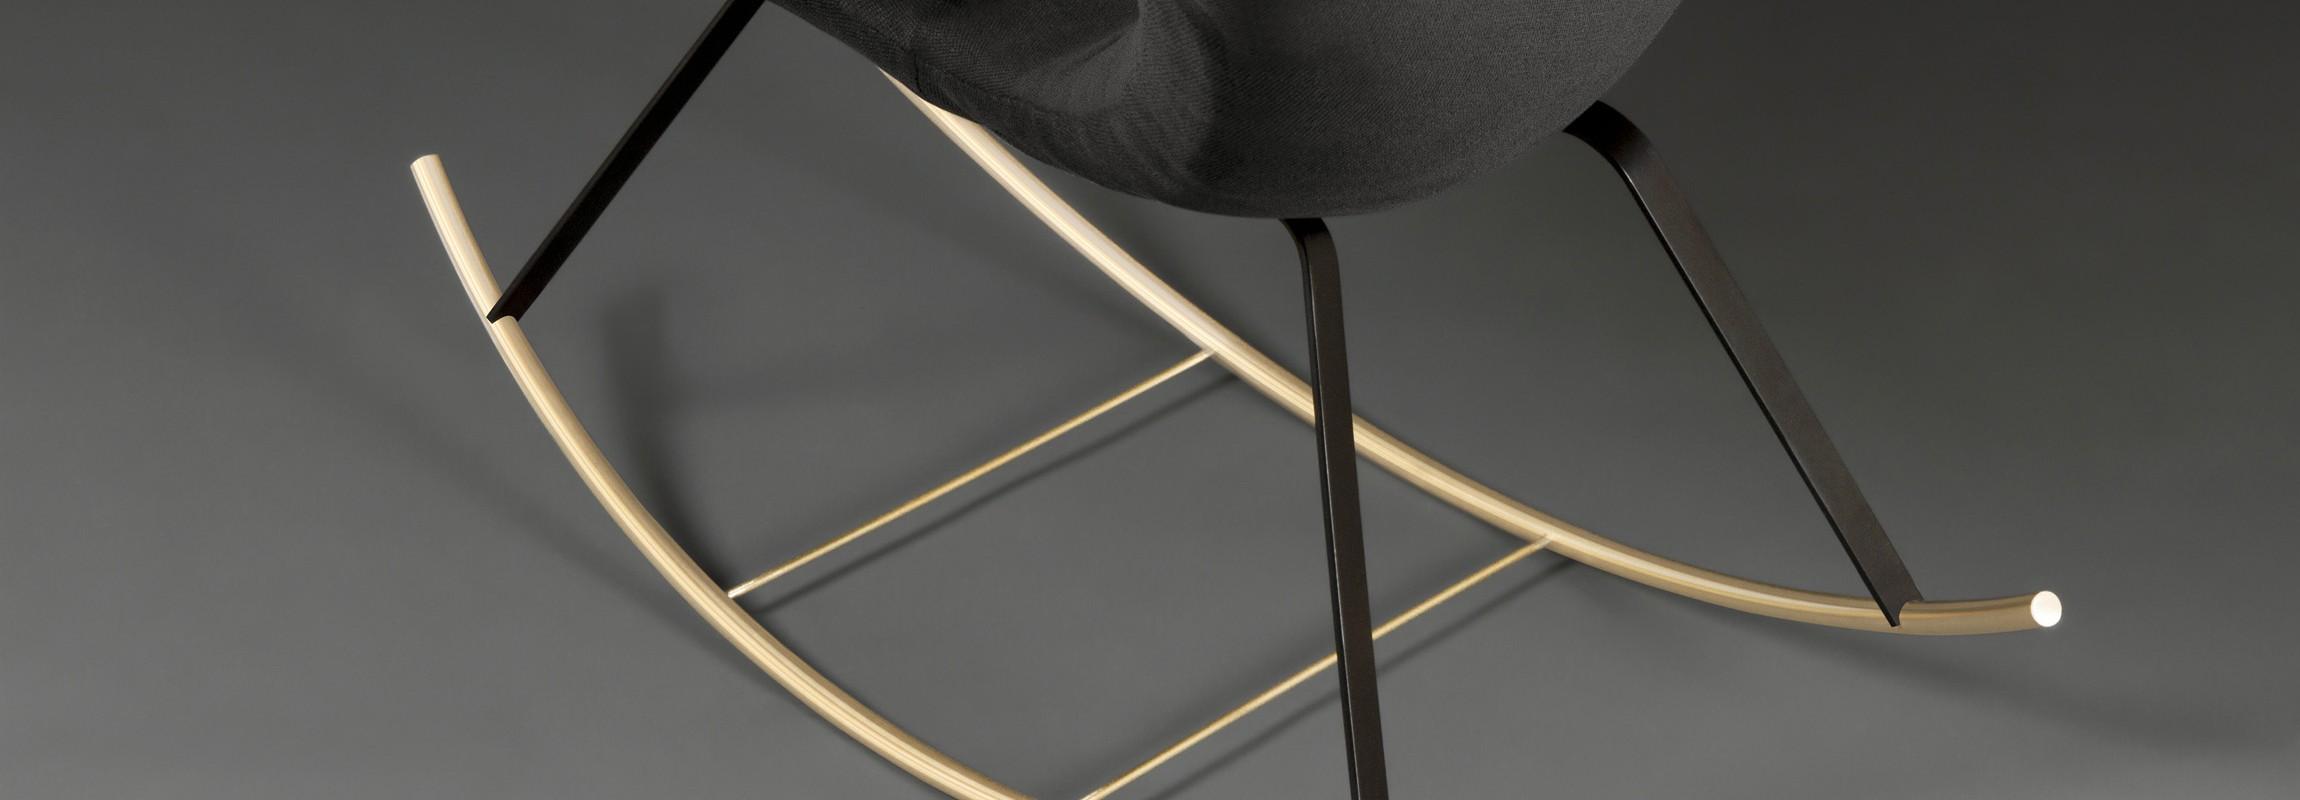 Great Egret Chair - SAYAR GARIBEH - 009